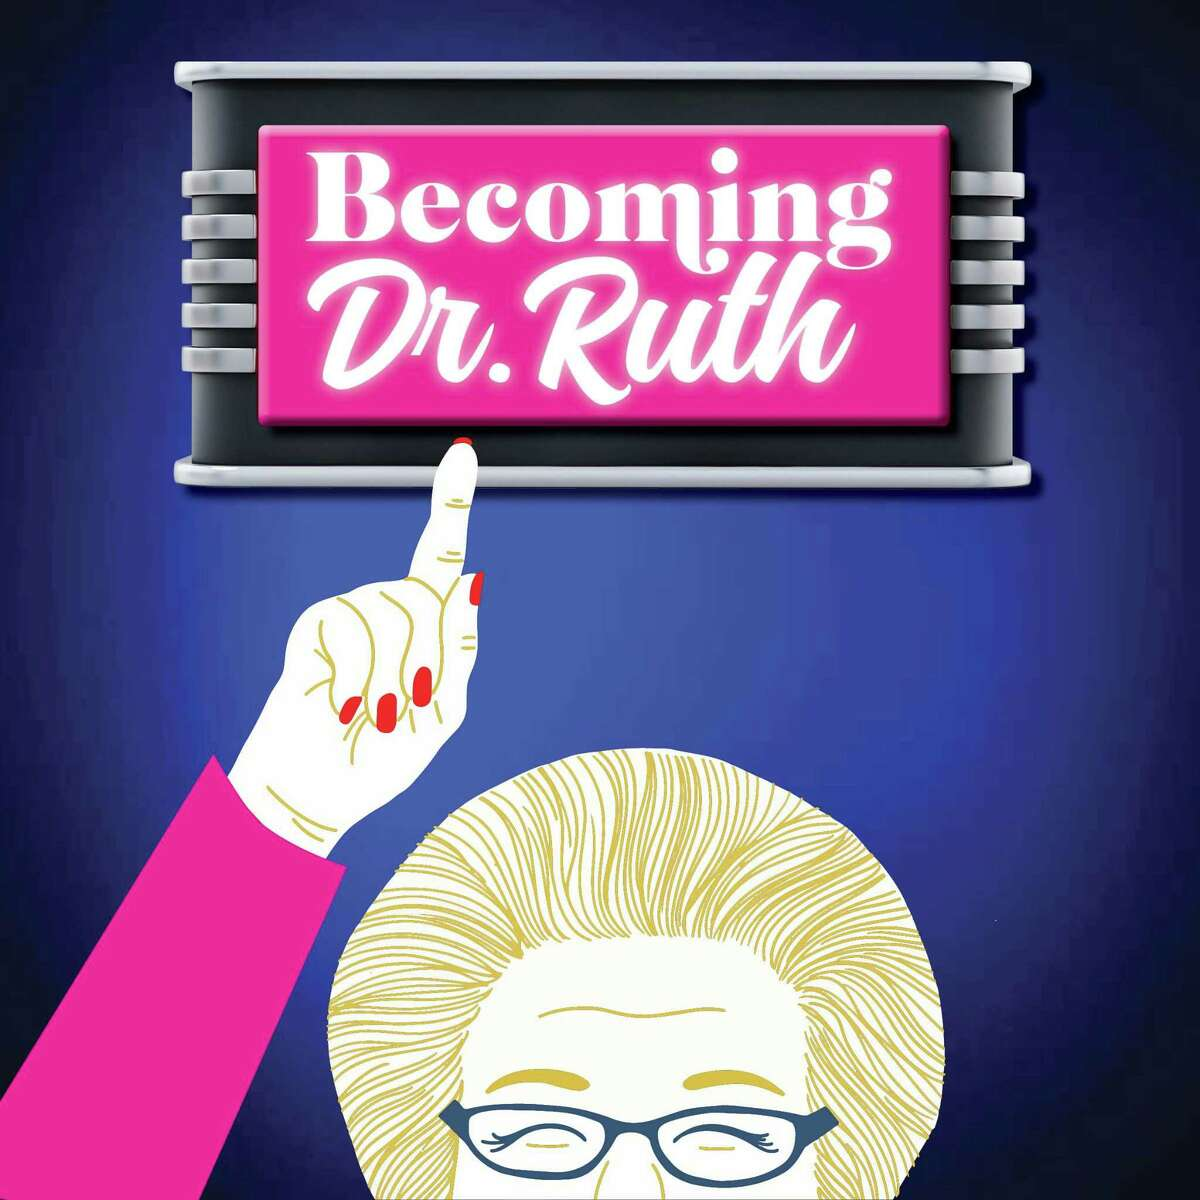 Becoming Dr. Ruth logo.